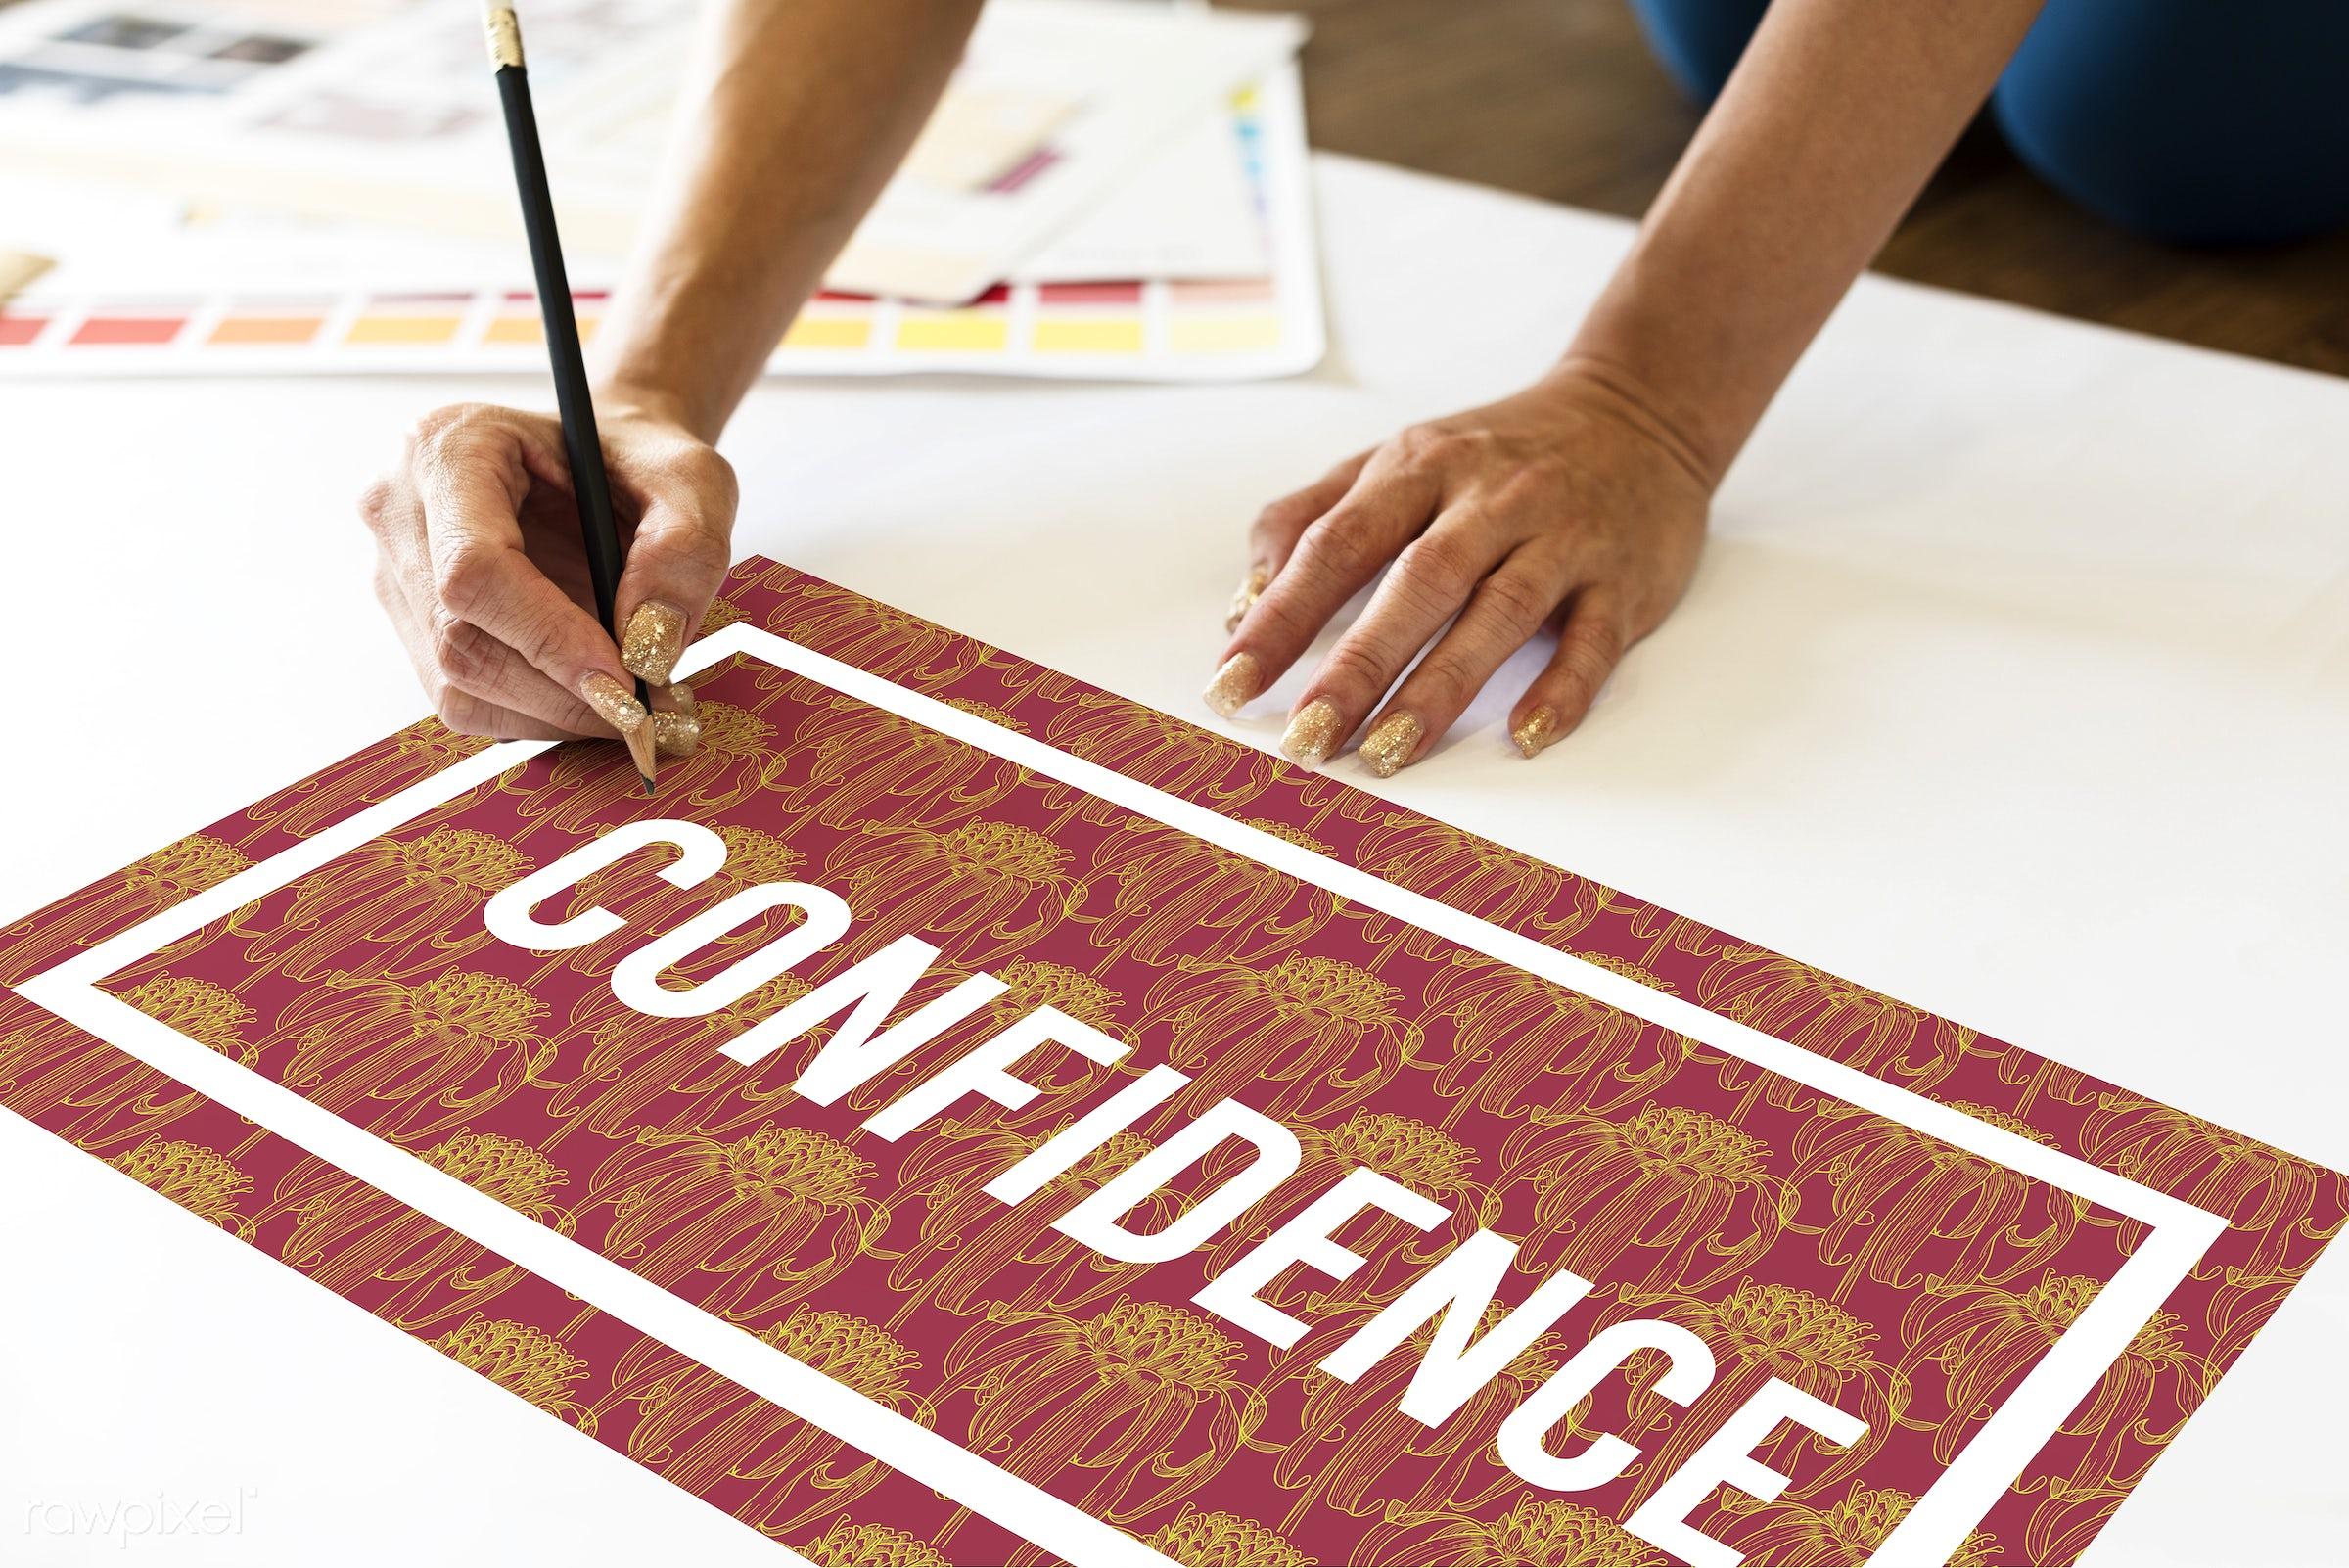 art, attitude, confidence, creation, creative, creativity, design, drawing, faith, feeling, flowers, graphic, hands, idea,...